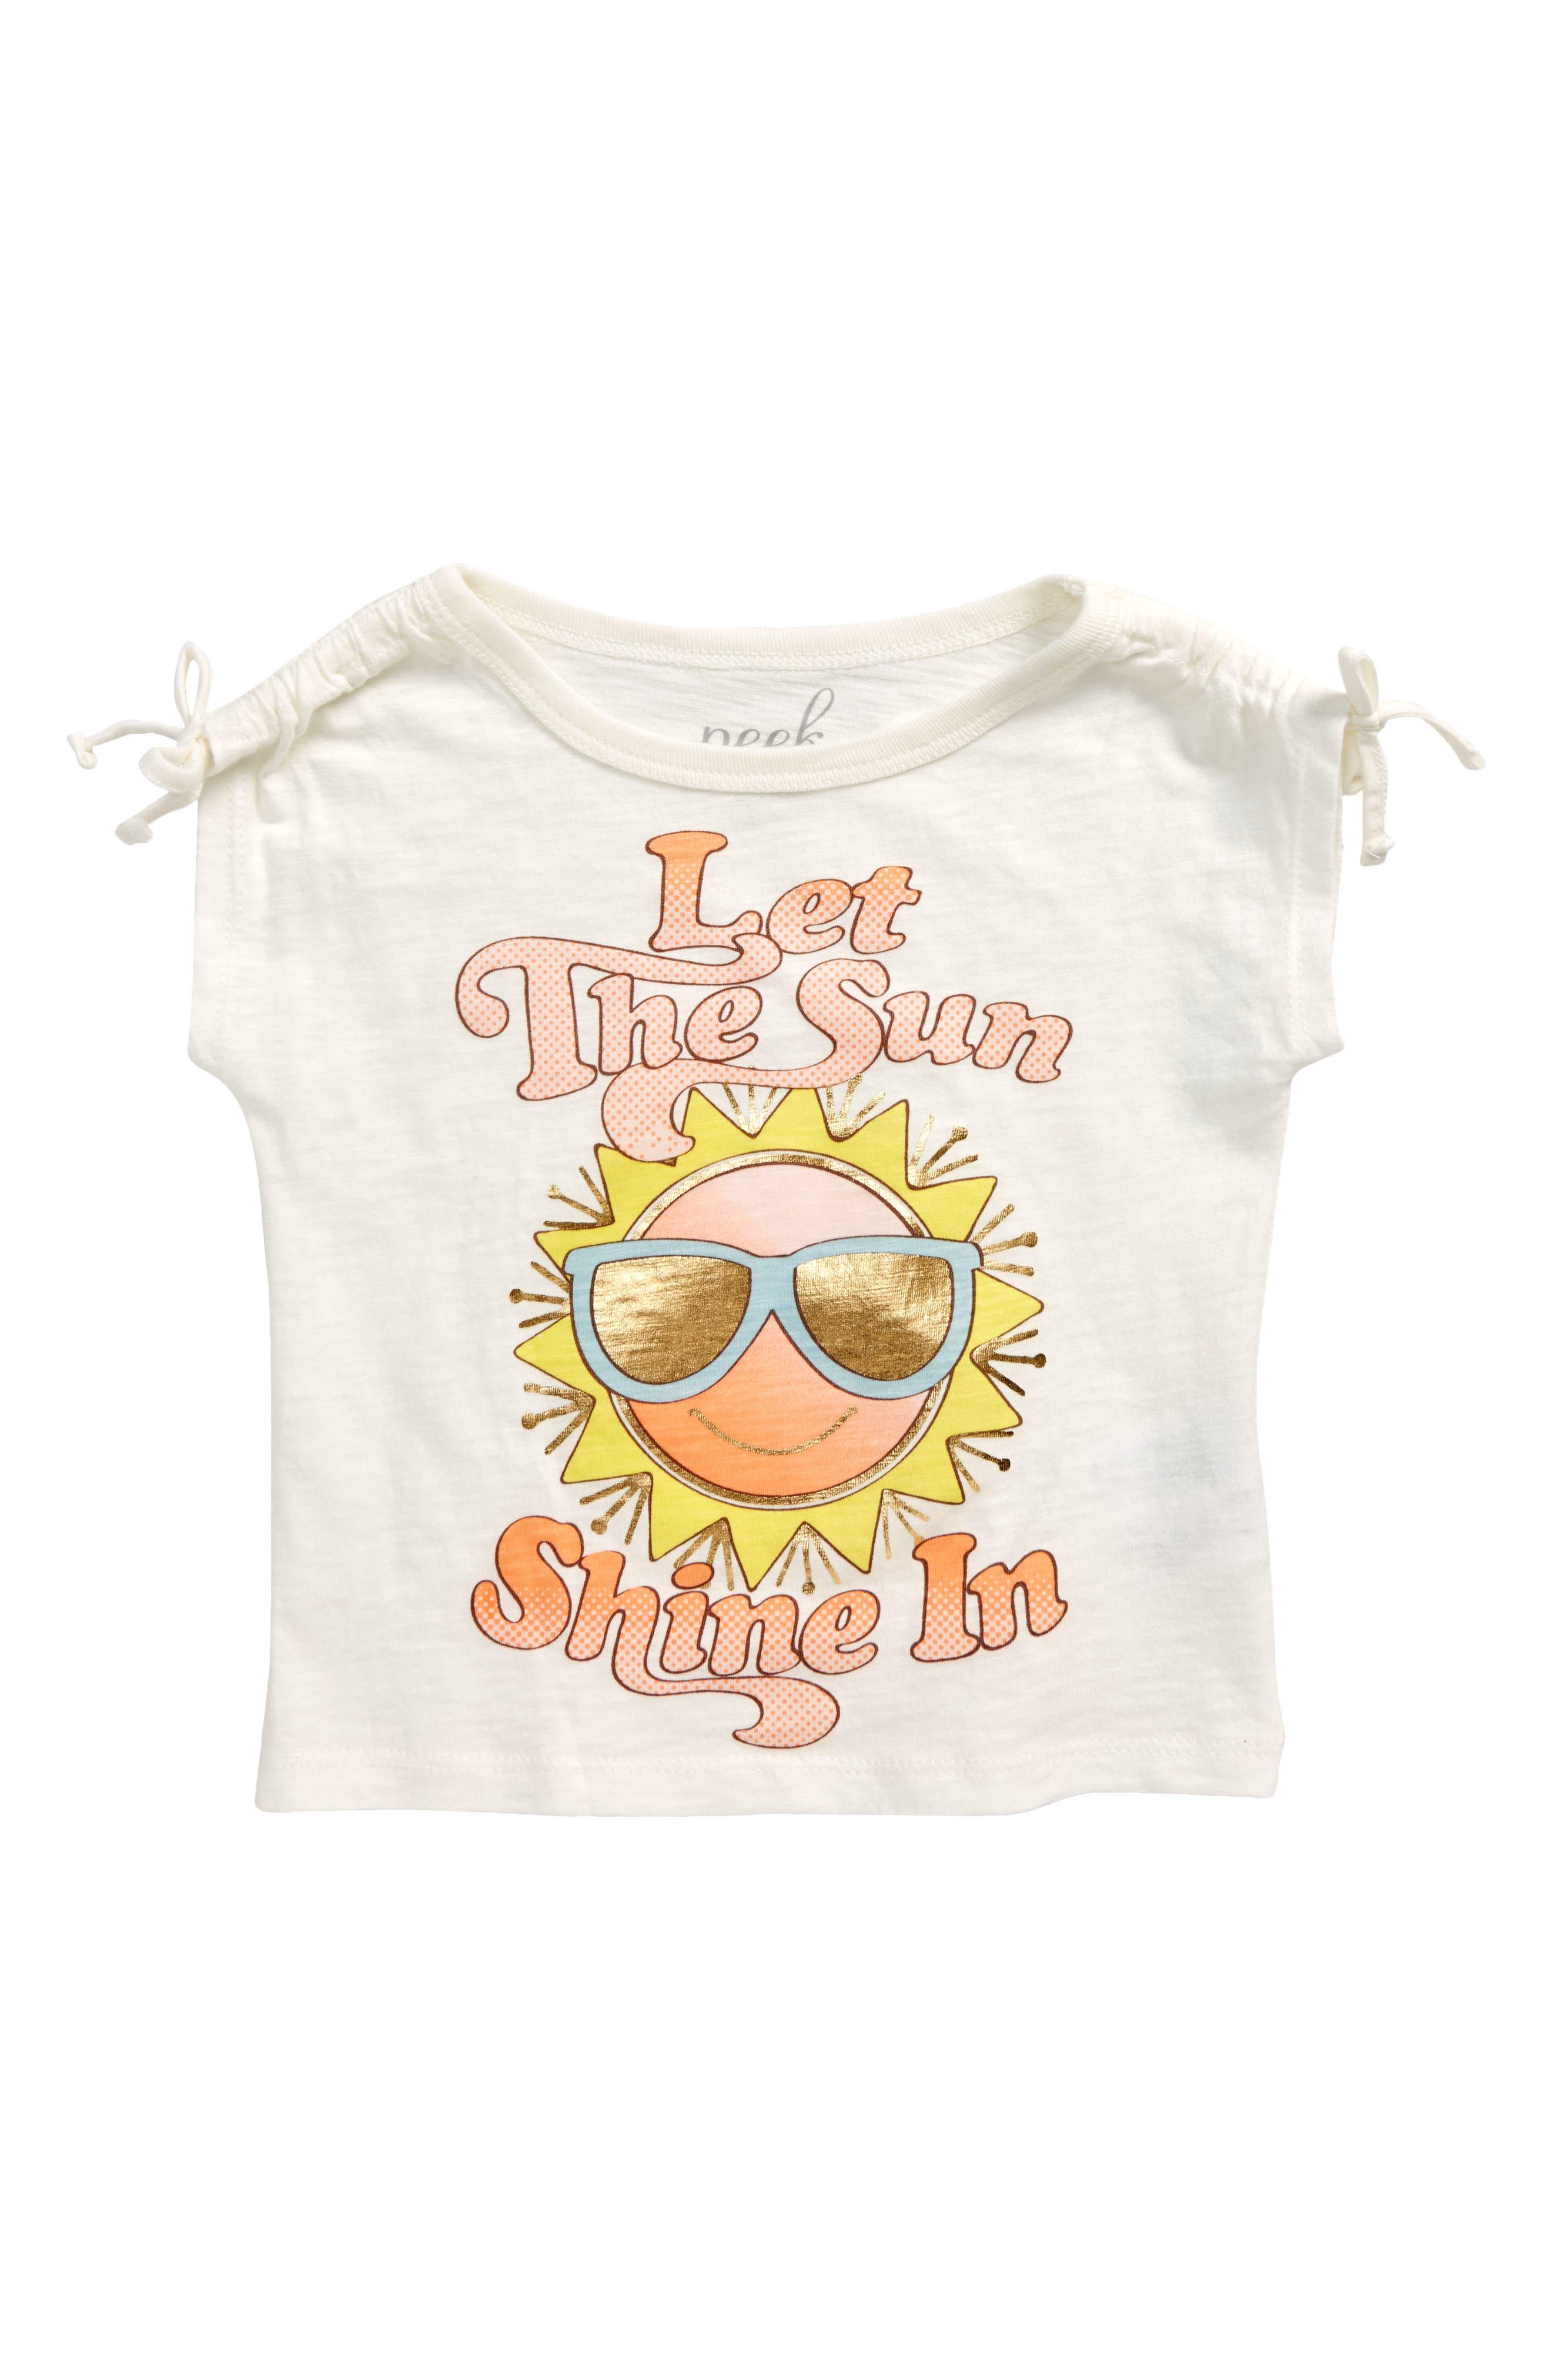 Girls Ciri Top Butter Double gauze top Loose girls top Toddler girl top Summer sleeveless top Ethical kids clothing